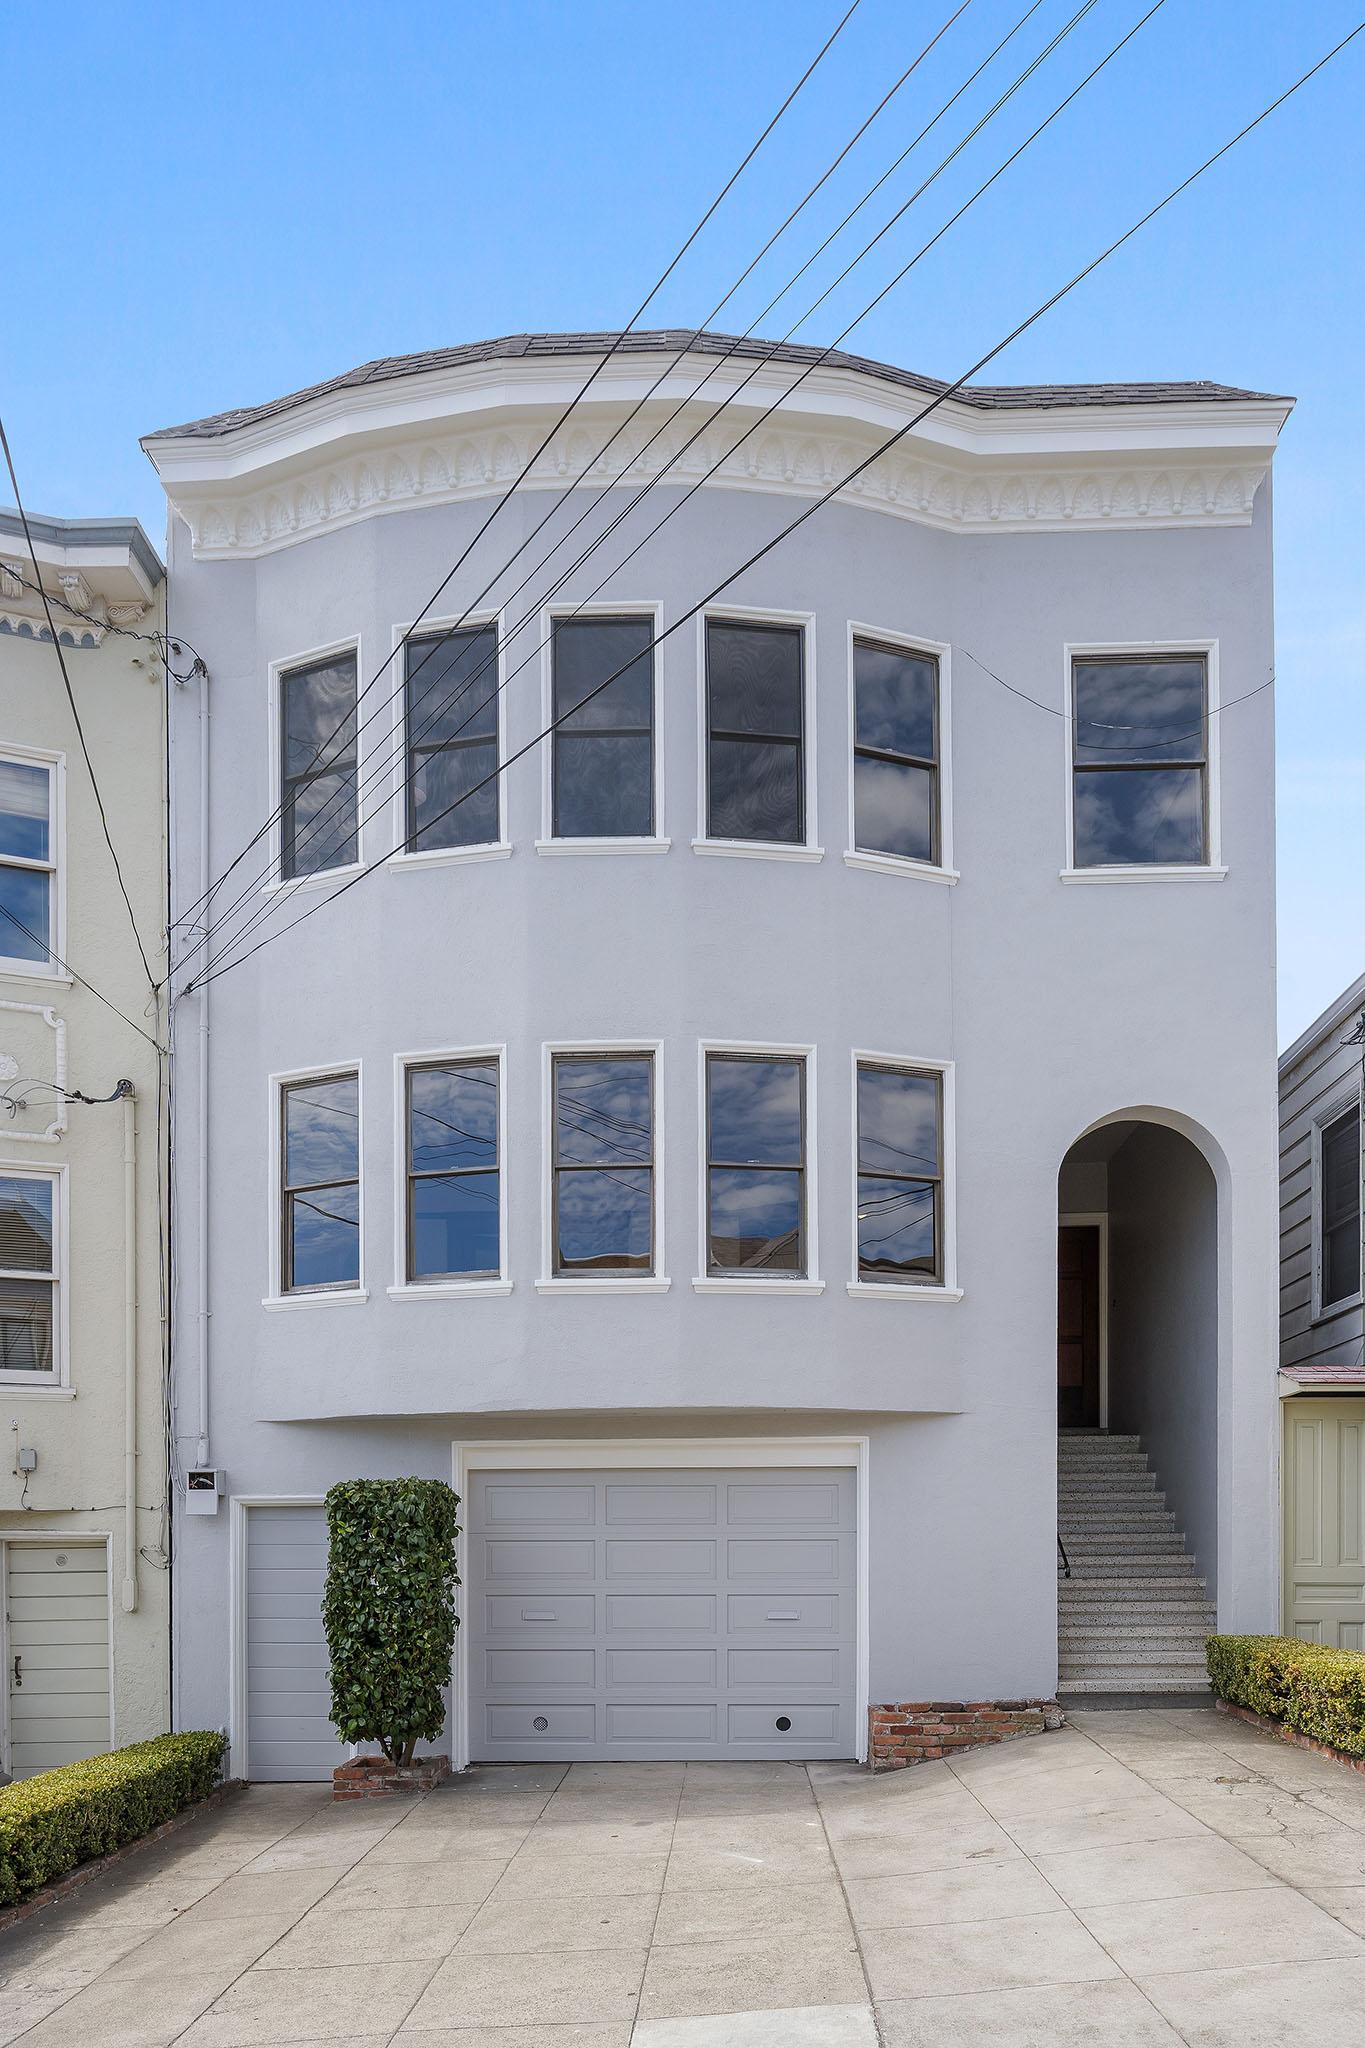 2355-2357 21st Ave., San Francisco